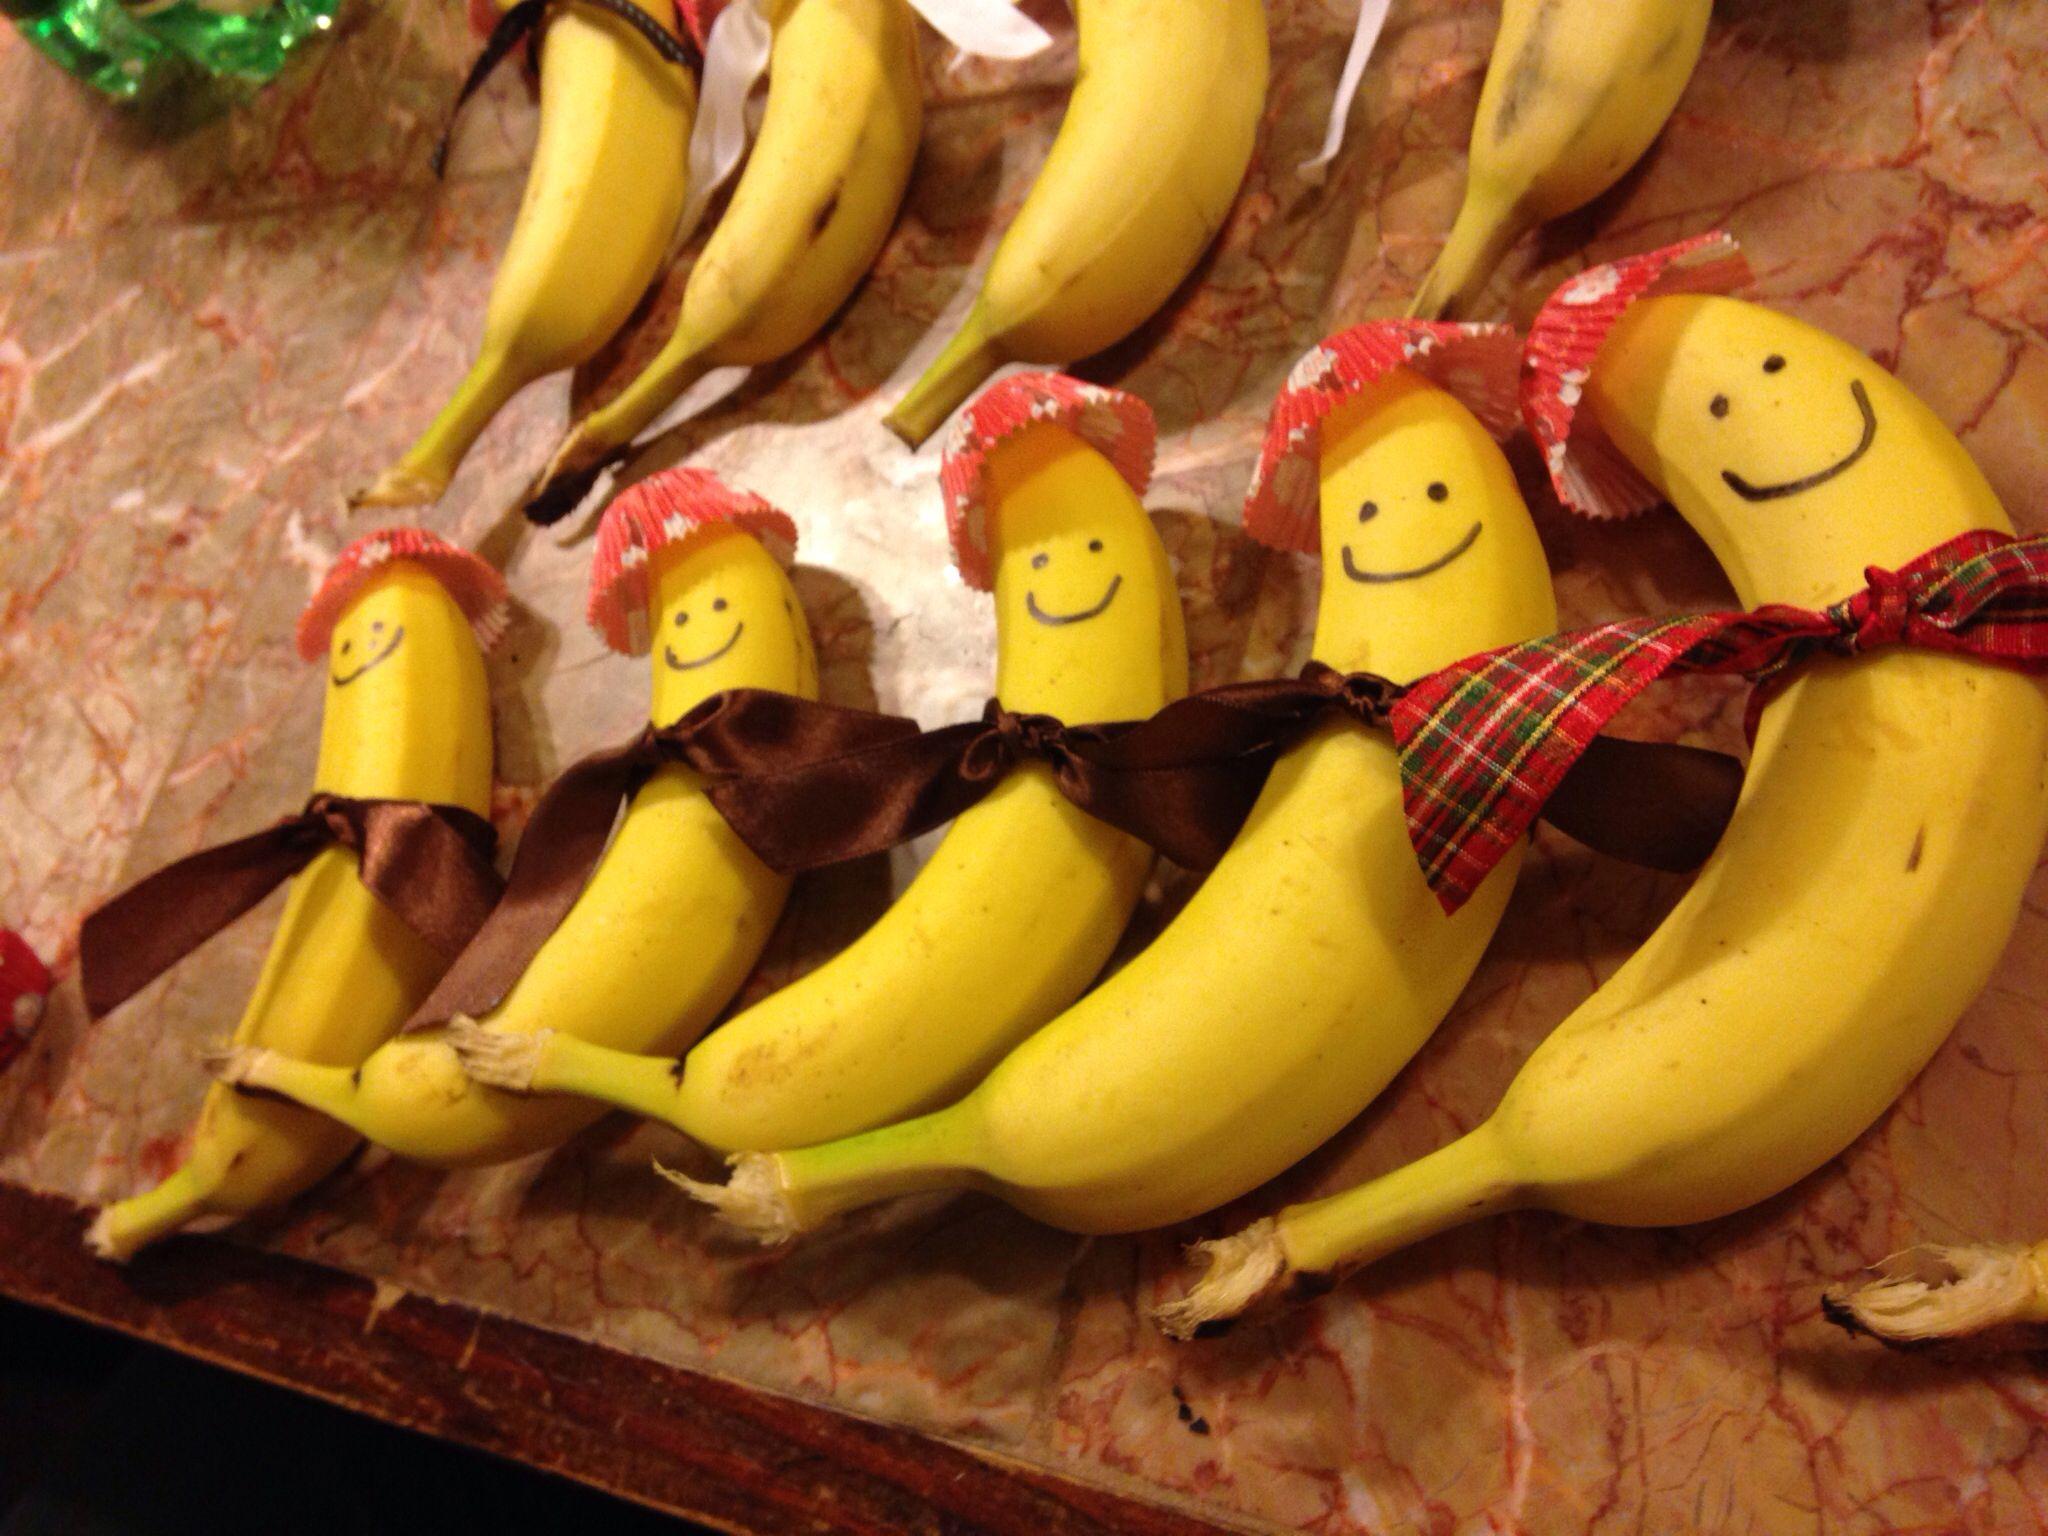 Snow Day Banana People Snacks For Preschool